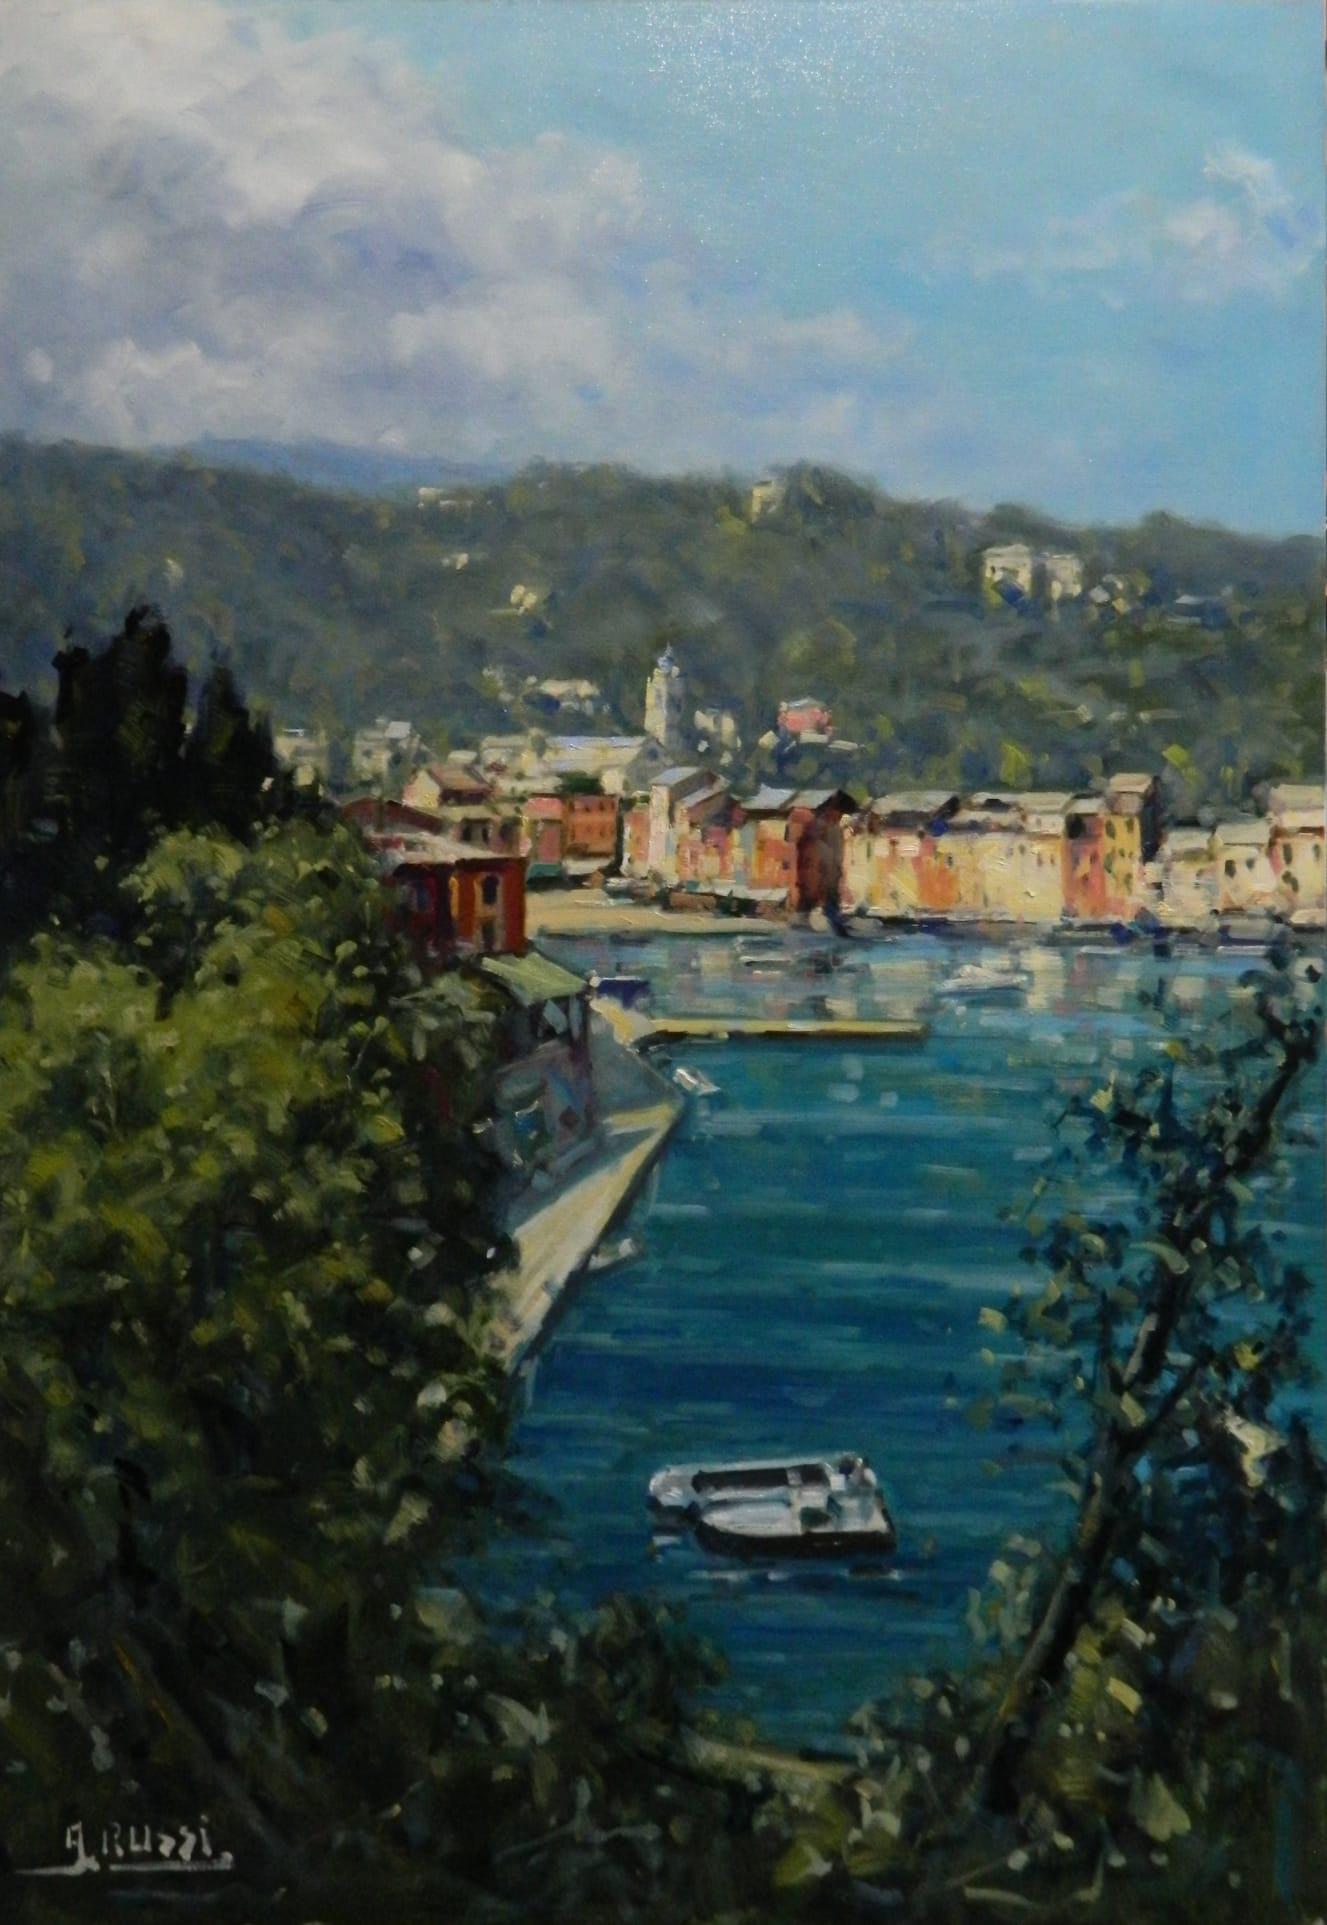 Antonio Splendor in Portofino 70x100